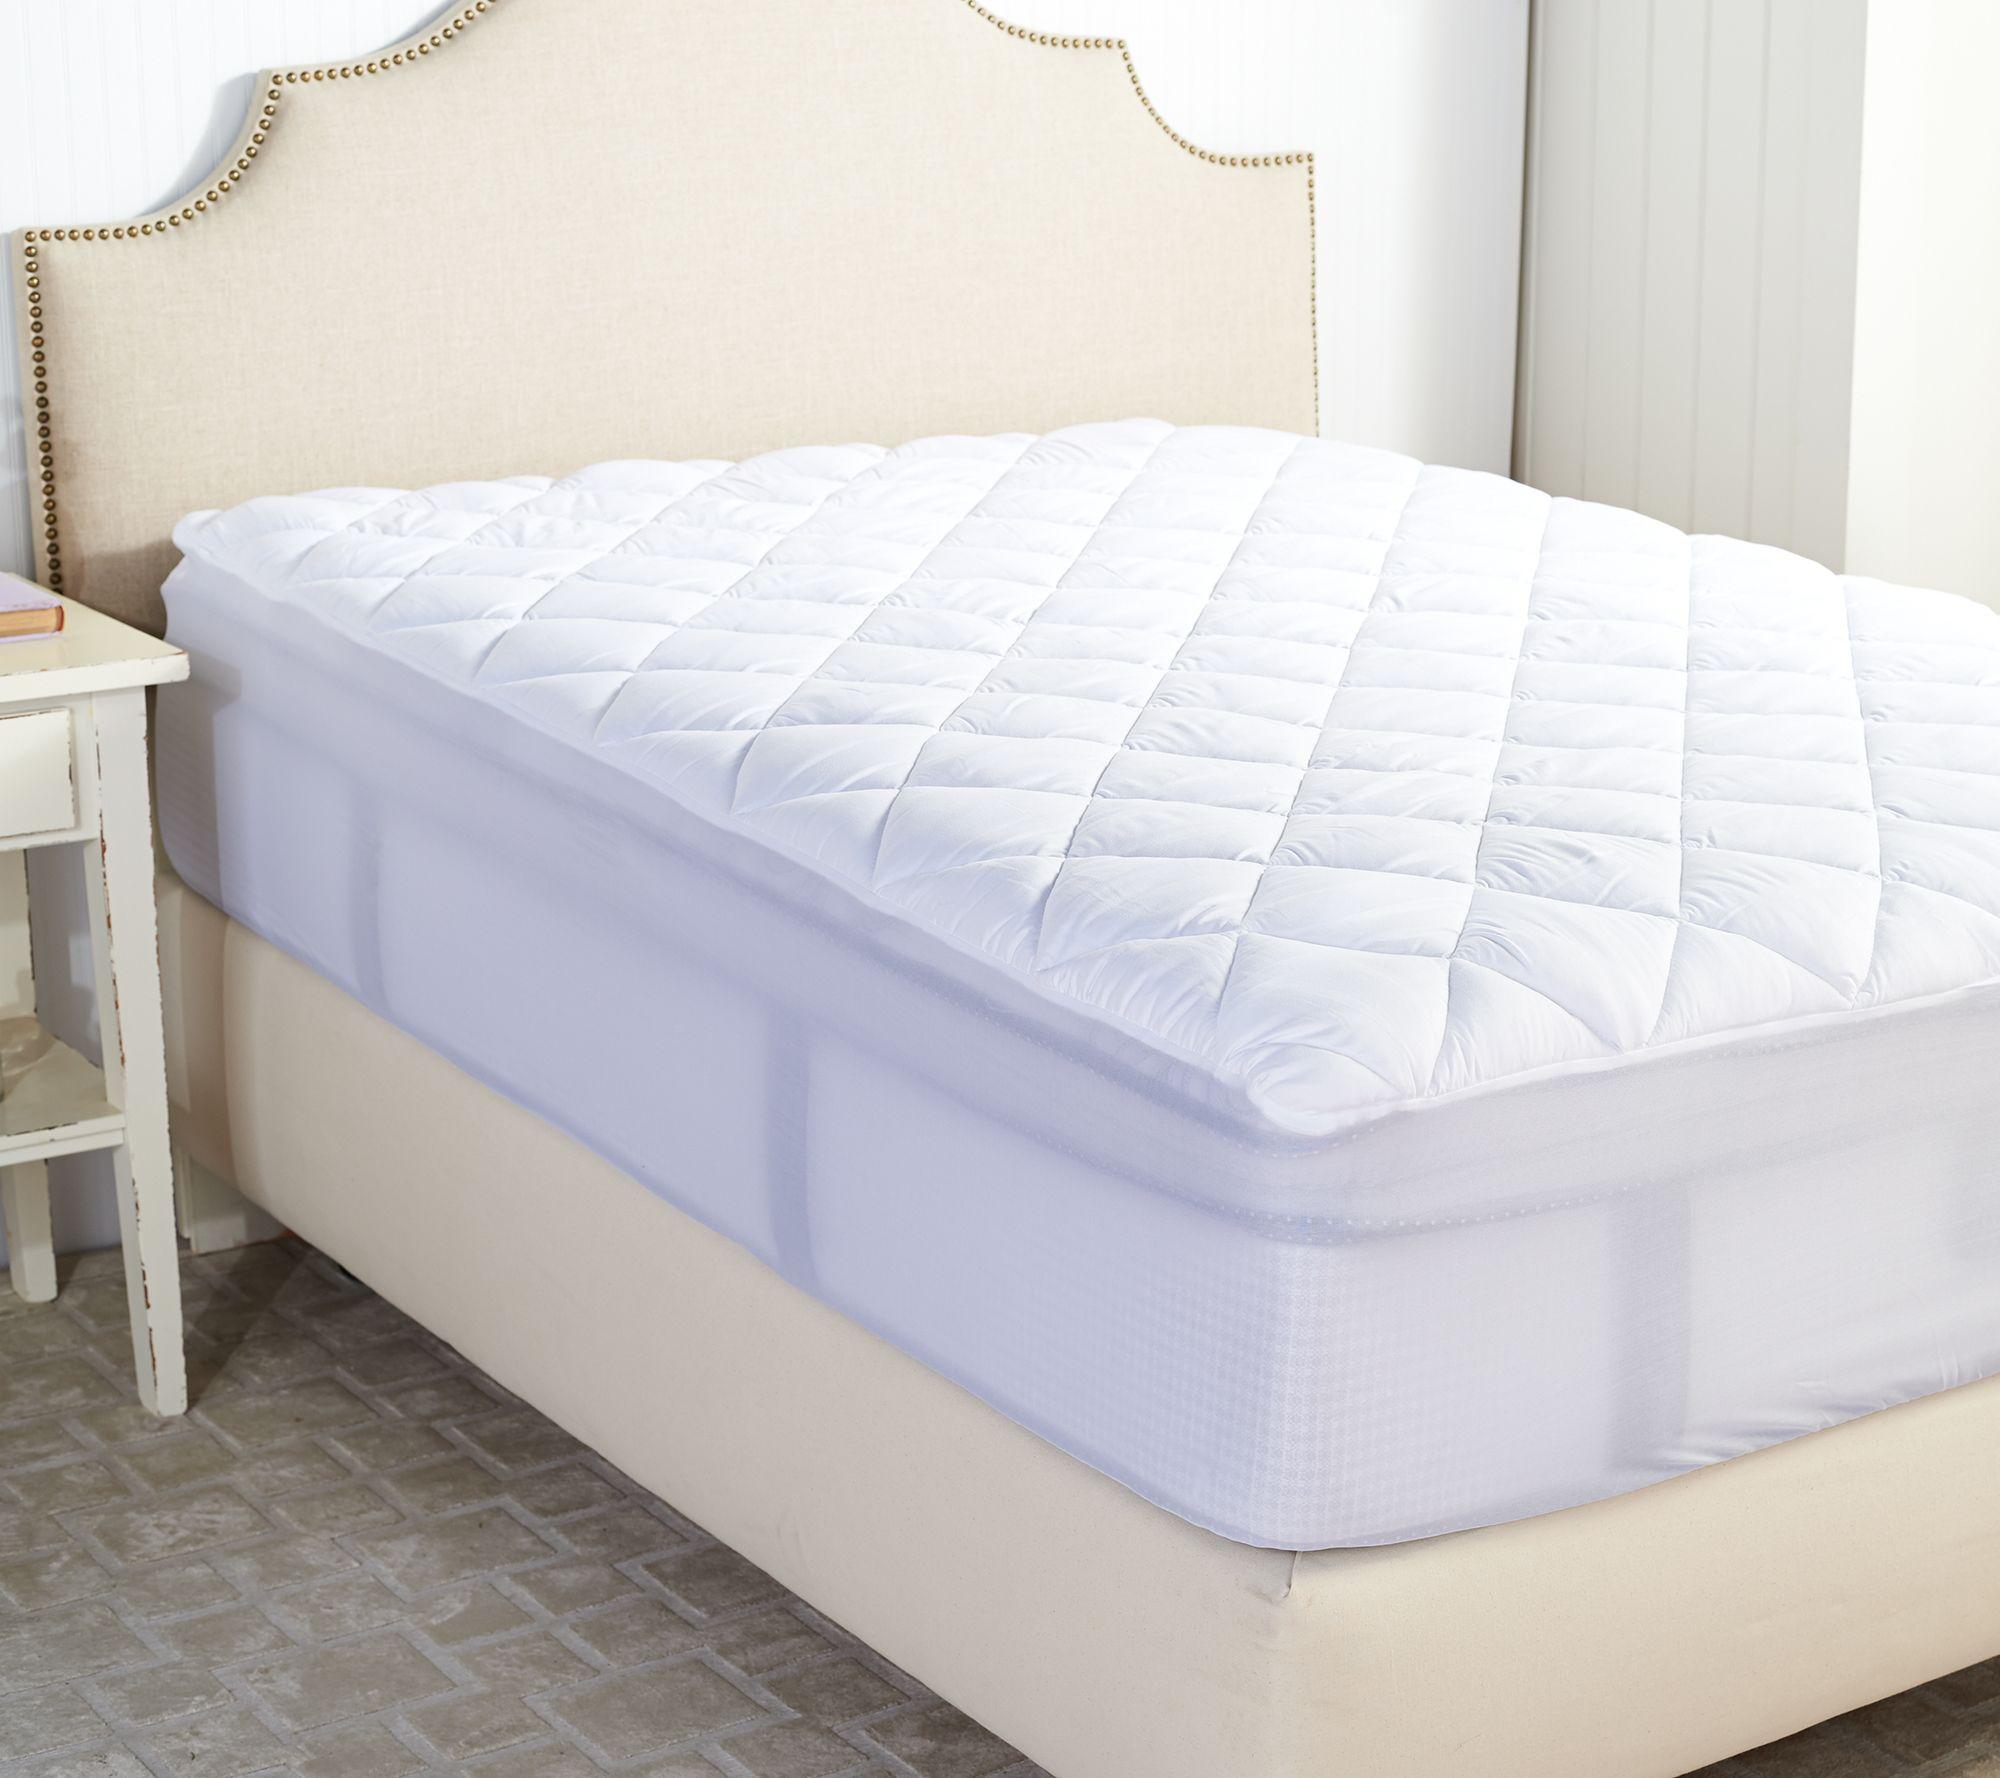 serta twin mattress. Serta Perfect Sleeper CalKing Mattress Pad With Nanotex Technology - Page 1 \u2014 QVC.com Twin T